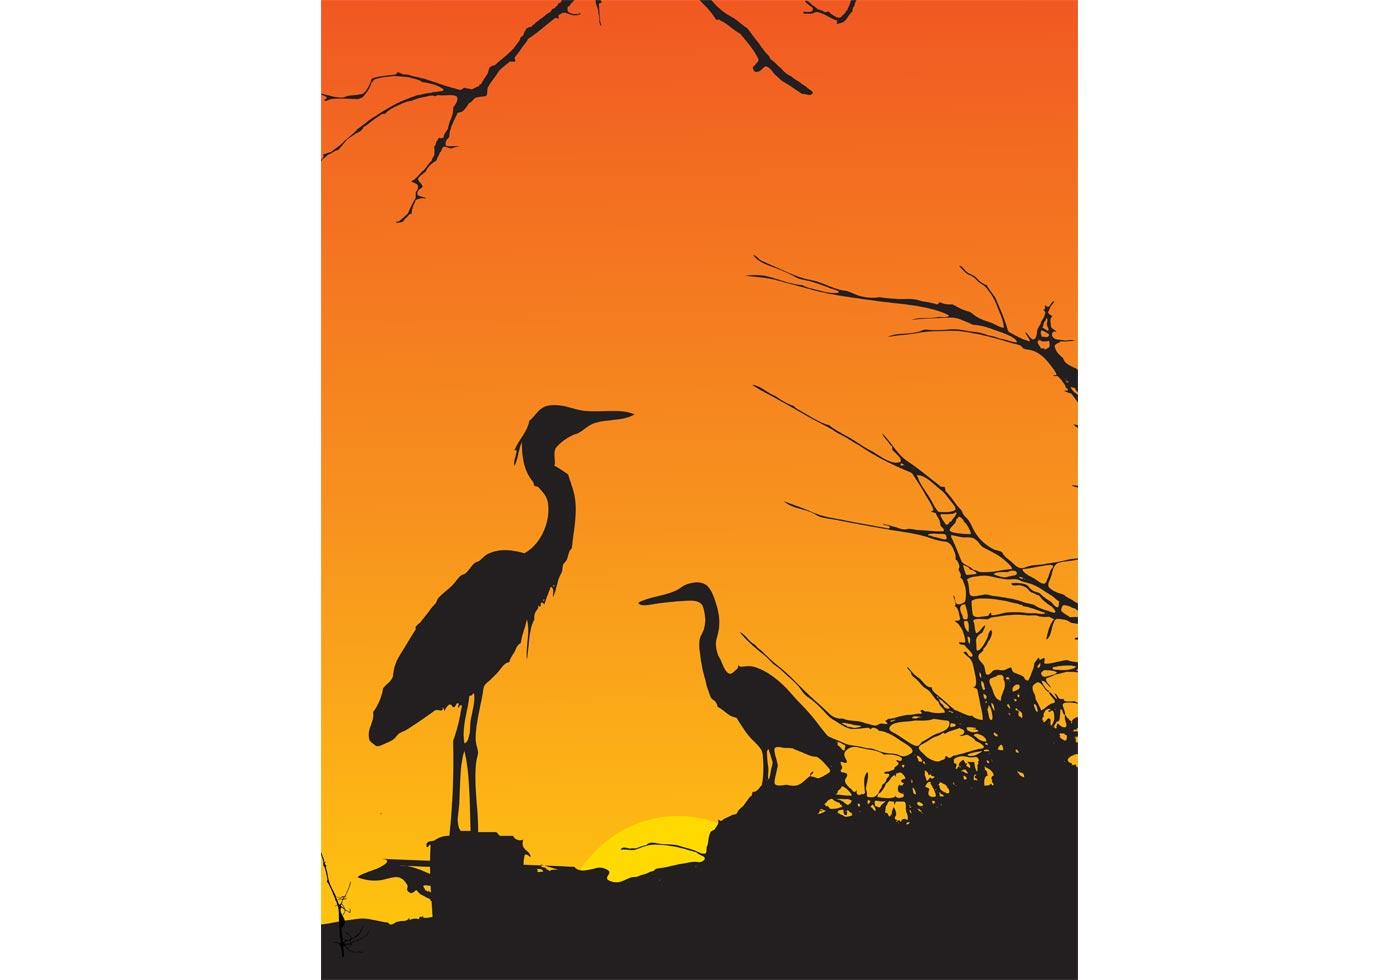 Boy And Girl Cartoon Wallpaper Herons Download Free Vector Art Stock Graphics Amp Images